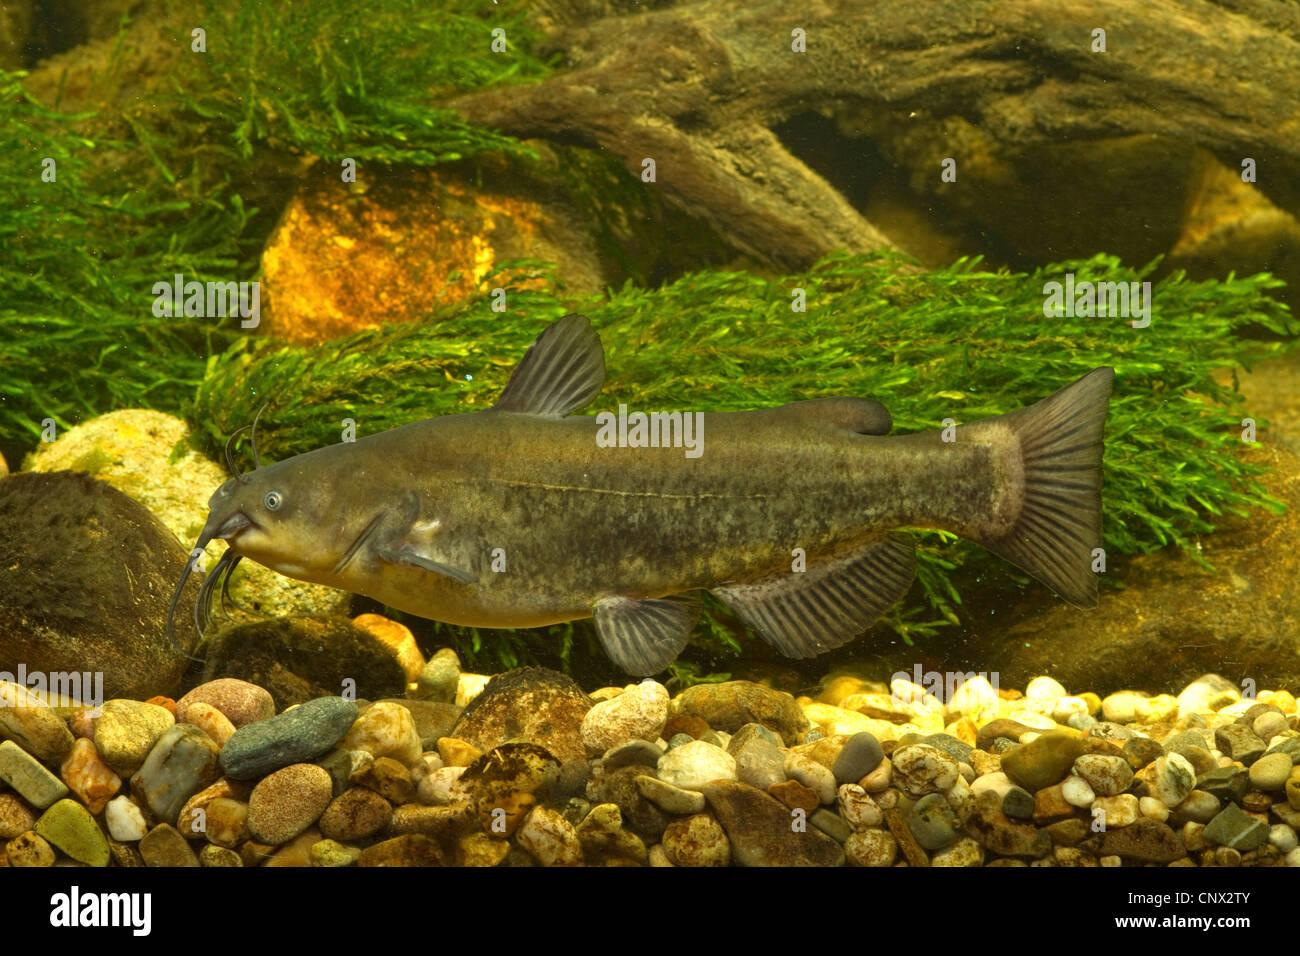 North American freshwater catfish (Ictaluridae), over shingle - Stock Image